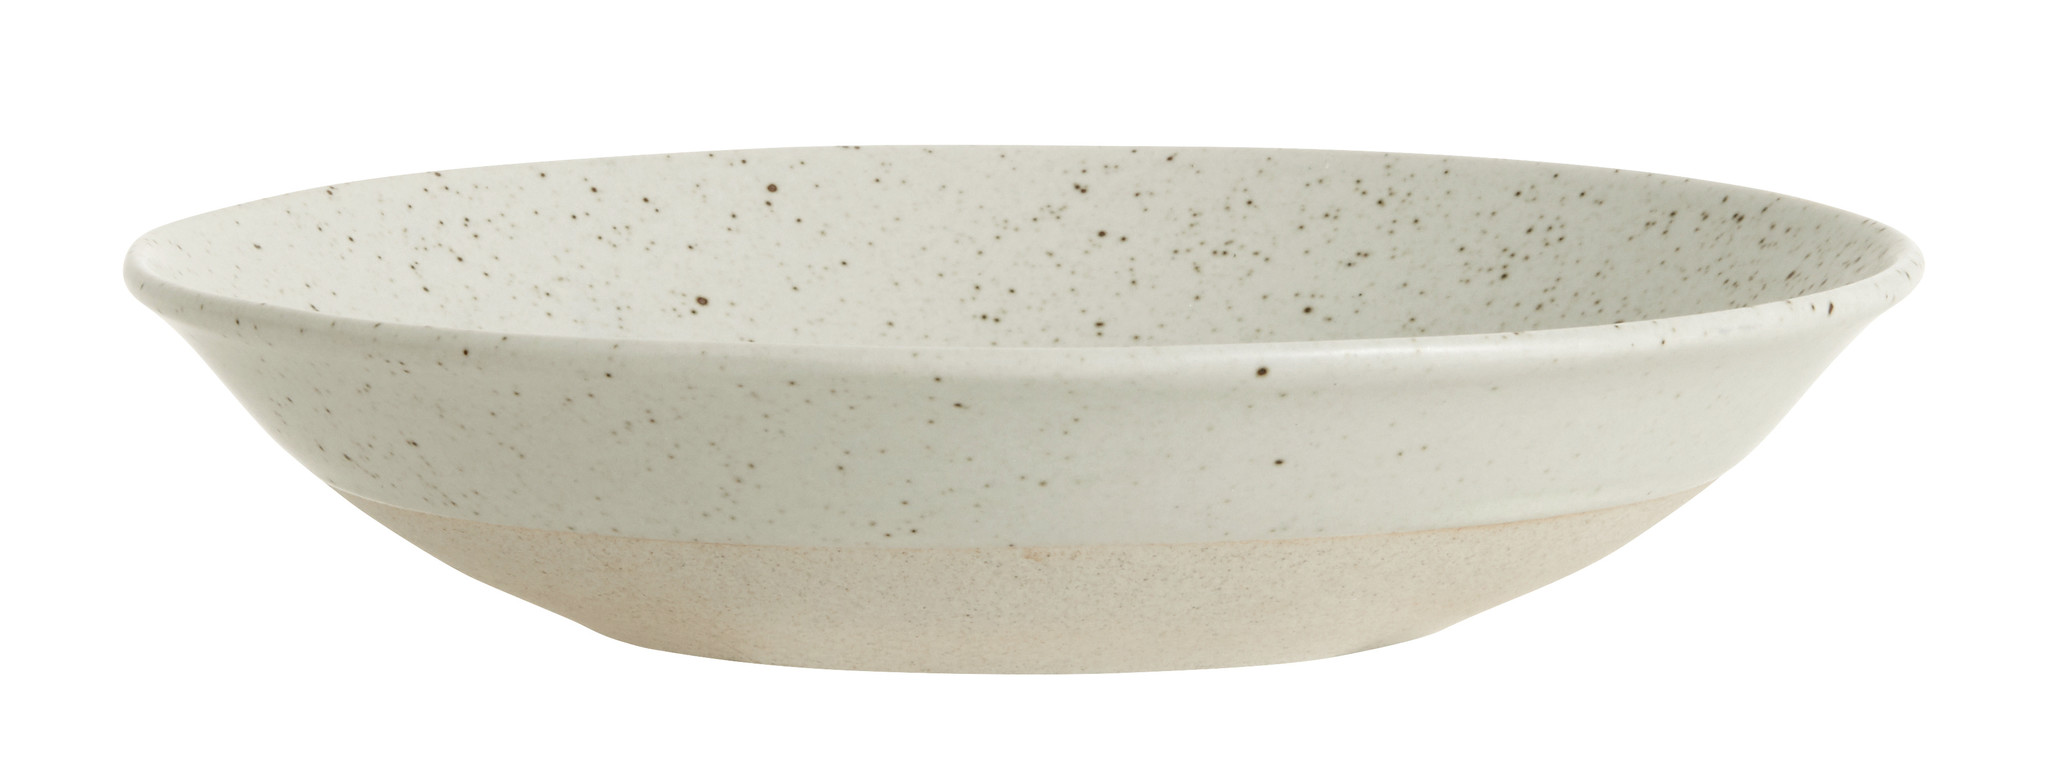 Nordal Grainy diep bord ø 22,5 cm - zandkleur- 57010-5708309157429